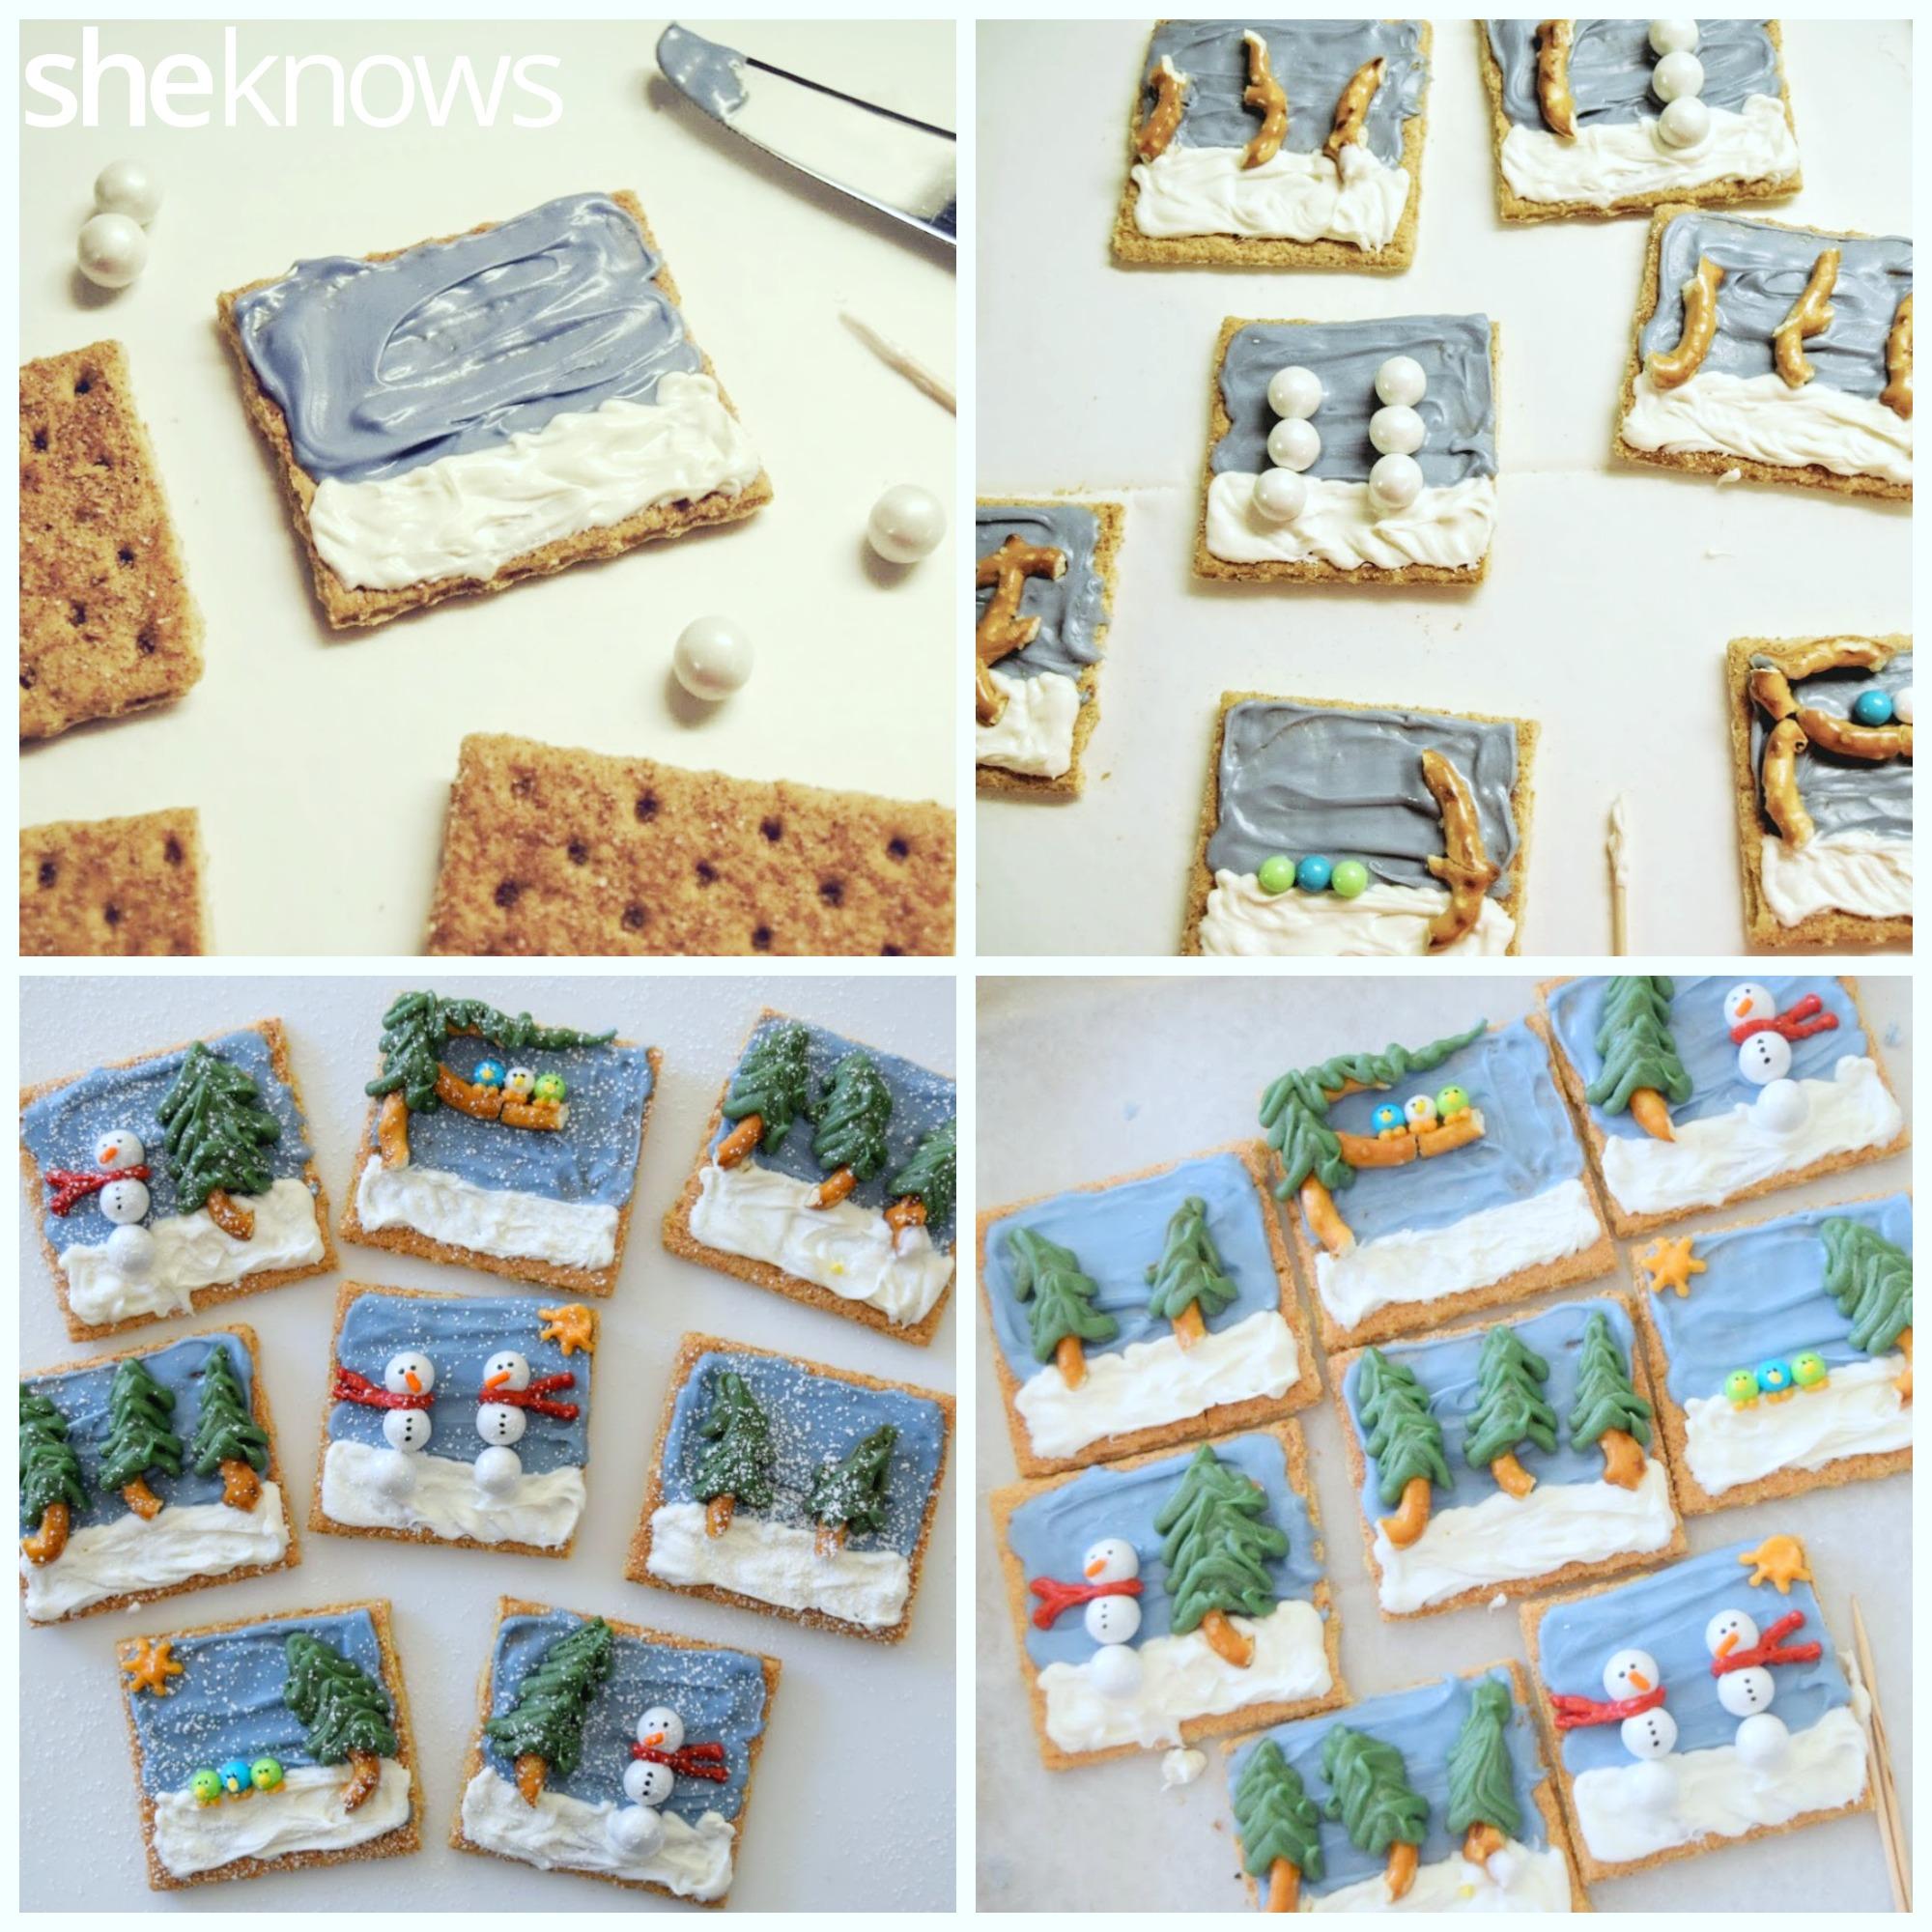 Graham-cracker-edible-treat